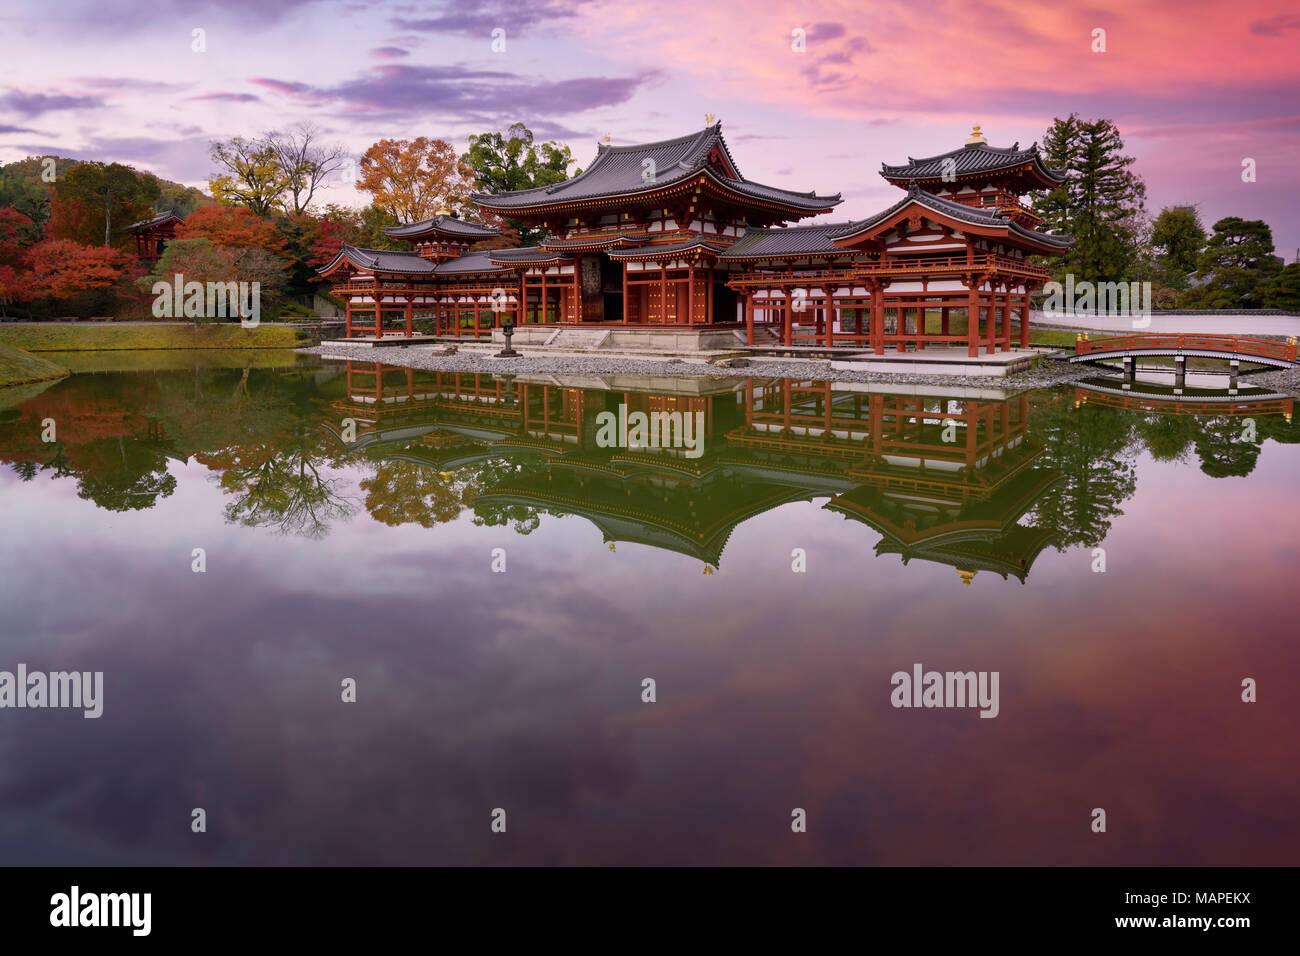 Tranquilo paisaje de otoño el Phoenix Hall, salón de amida templo Byodoin en Kojima isla de Tierra Pura Jodoshiki entei, estanque de jardín. Uji, Kyoto Prefe Imagen De Stock